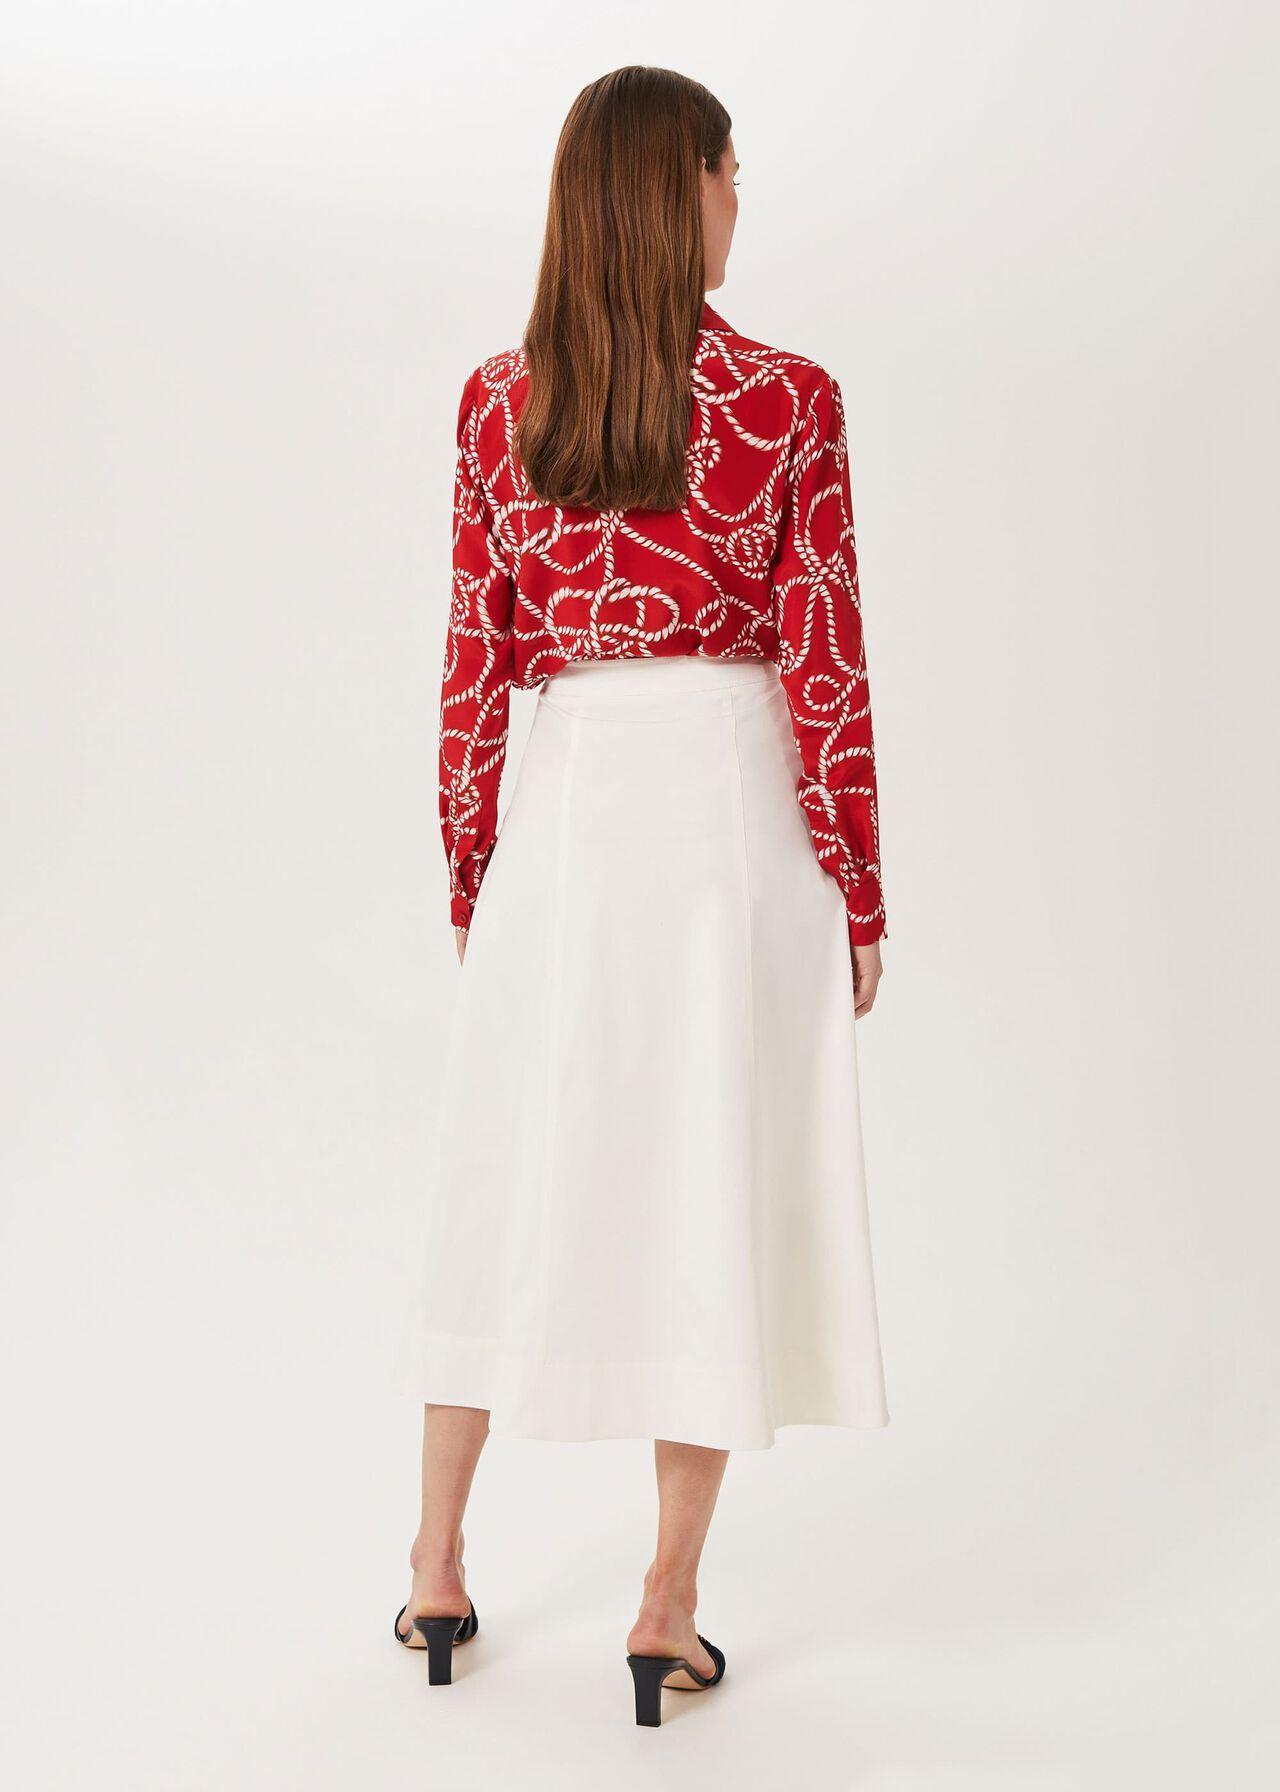 Venetia Cotton Midi Skirt, Natural, hi-res